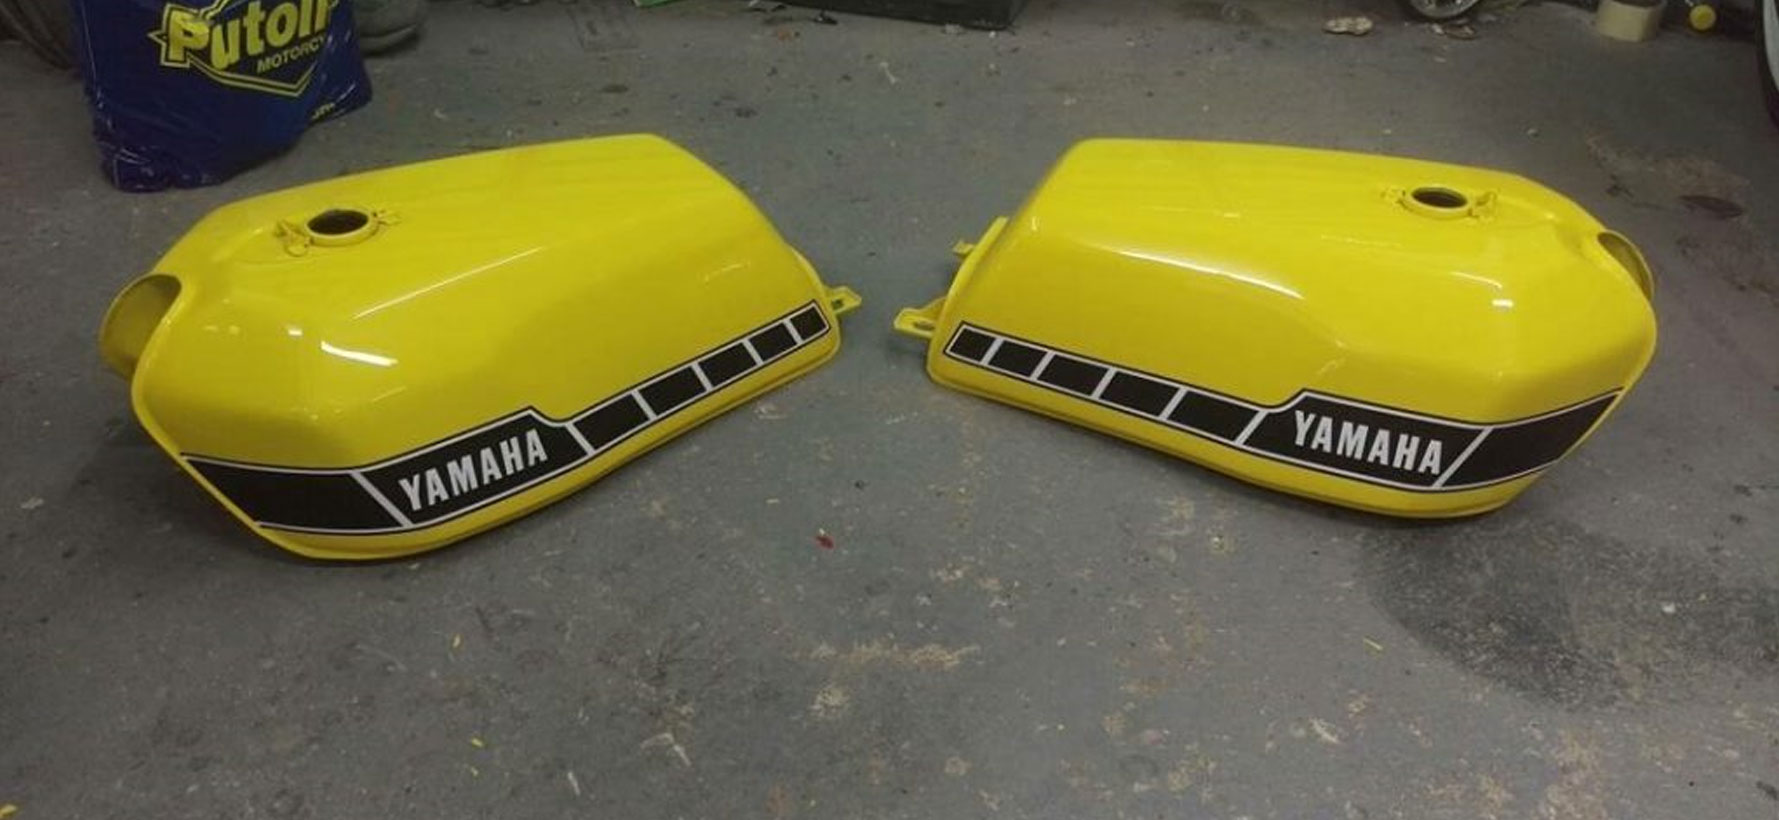 Yellow-Yamaha-Tanks